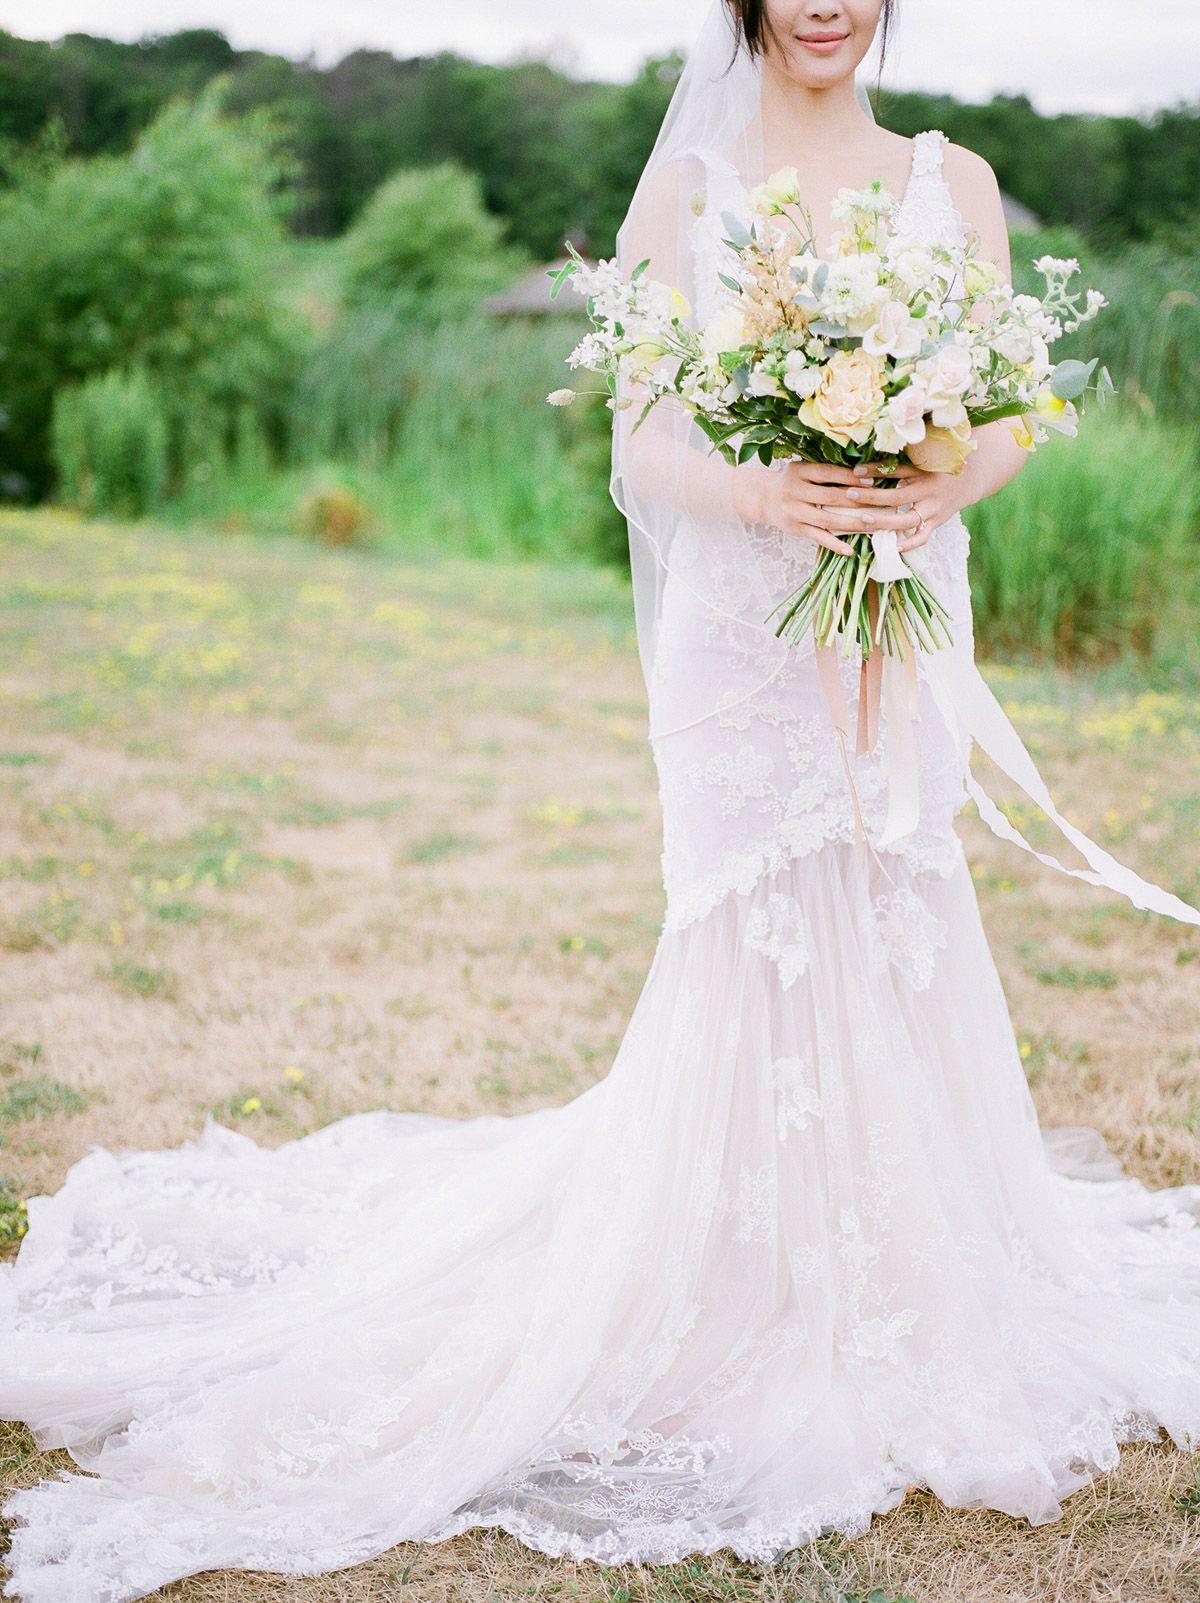 Jennifer Xu Rosewood Estate Winery Wedding Dresses Wedding